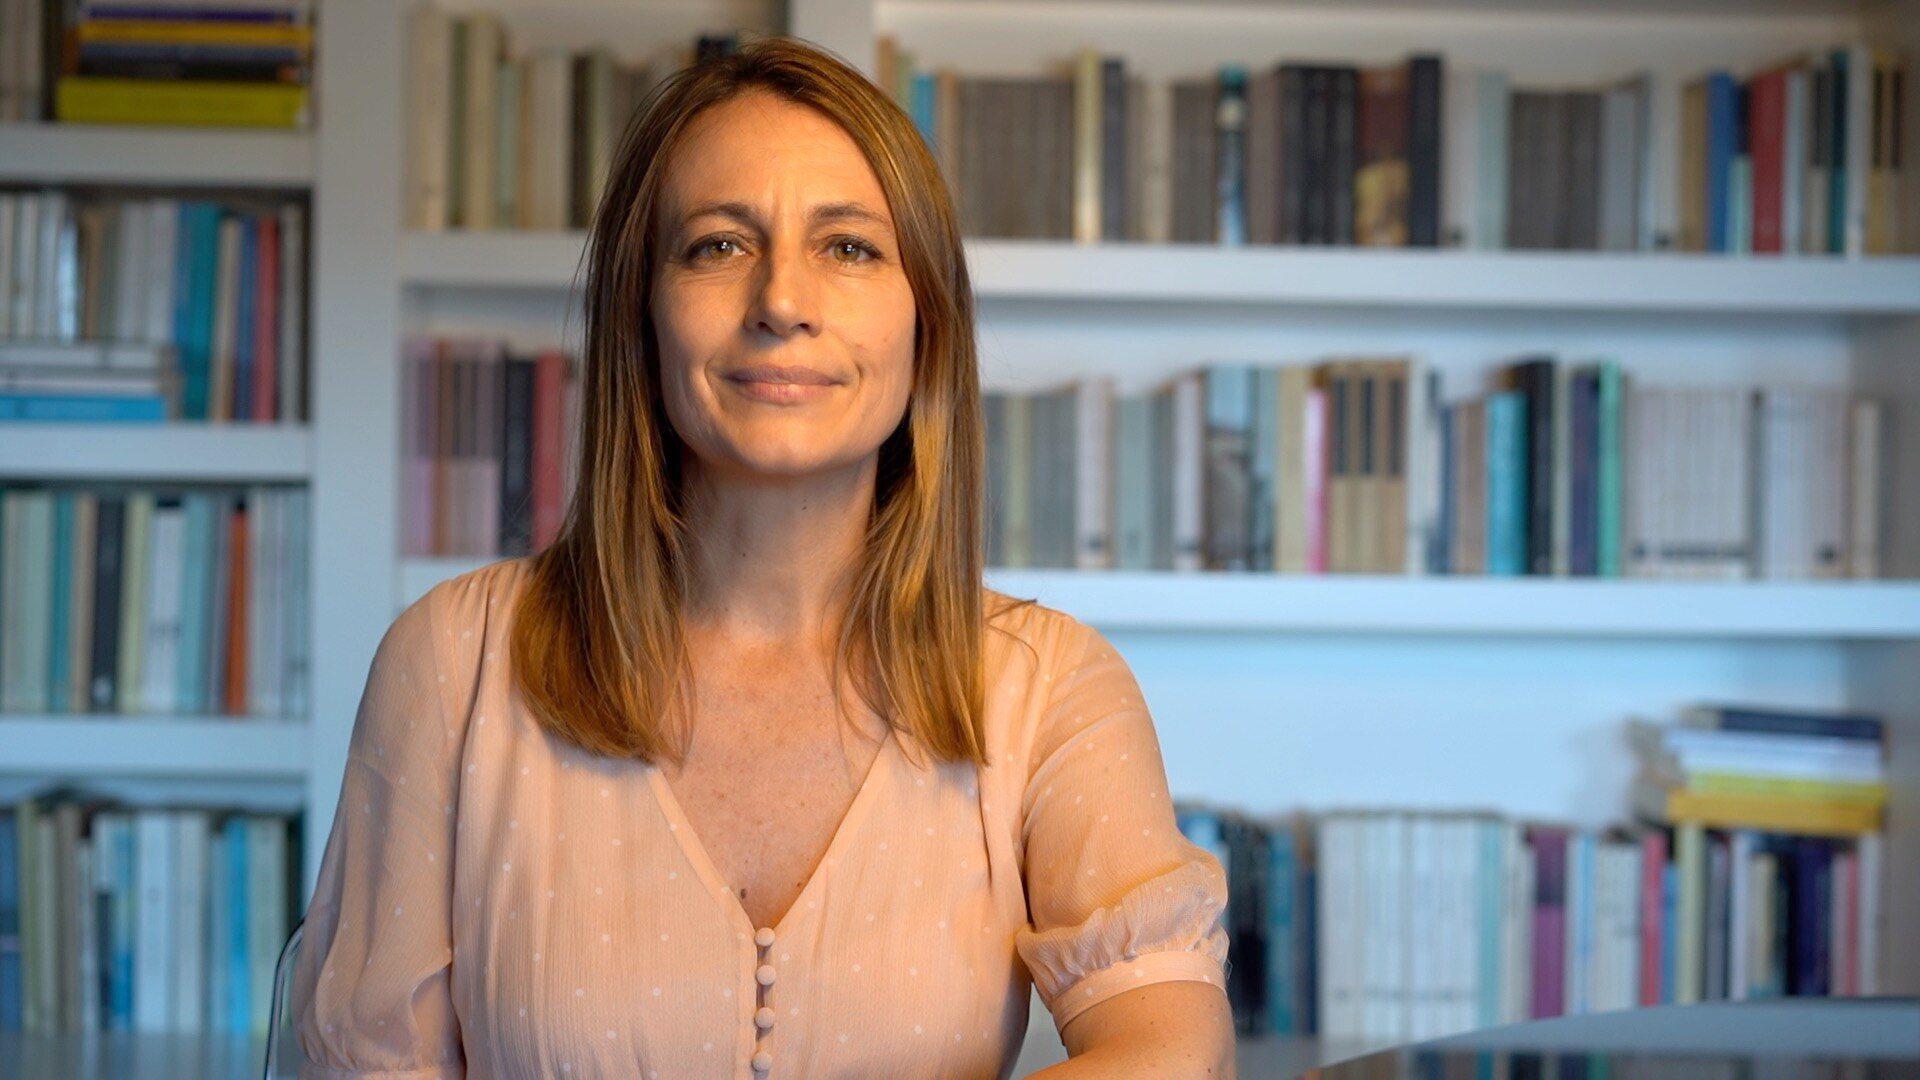 Il giardino dei mostri – Lorenza Pieri in conversation with Virginia Jewiss